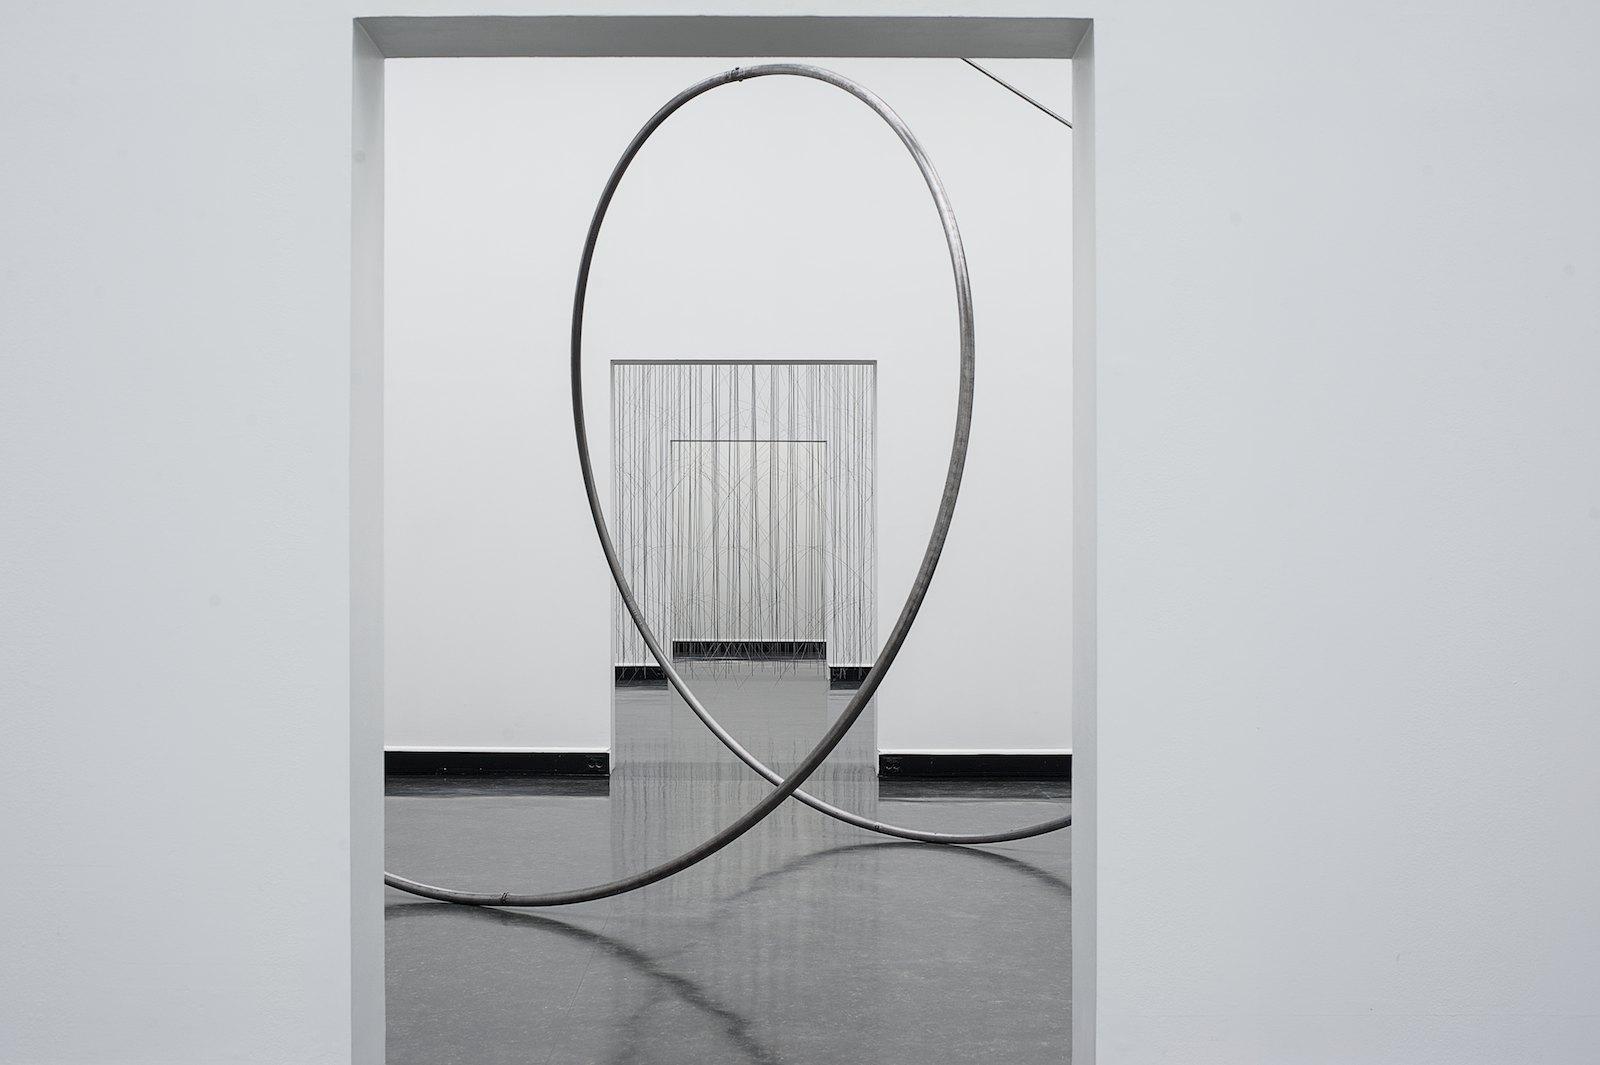 Muster II, 2014, steel, 783 x 945 x 490 cm, detail. Installation view, Tone Vigeland, Muster, Bergen Kunsthall, 2014. Photo: © Bergen Kunsthall